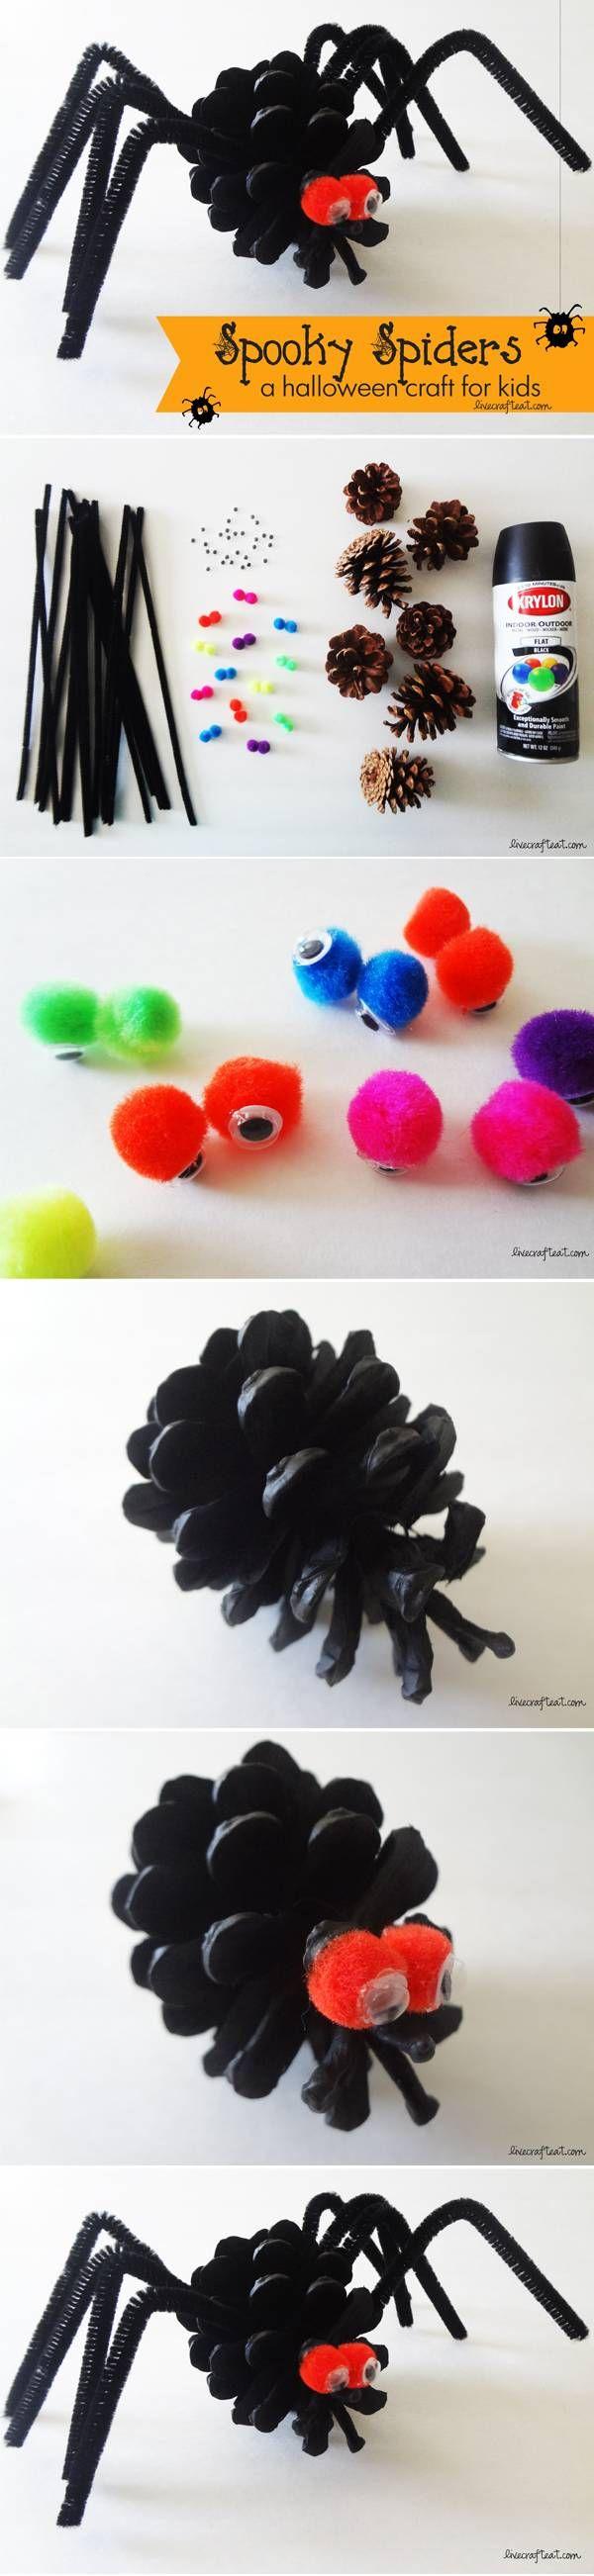 easy halloween craft for kids bricolage halloween. Black Bedroom Furniture Sets. Home Design Ideas